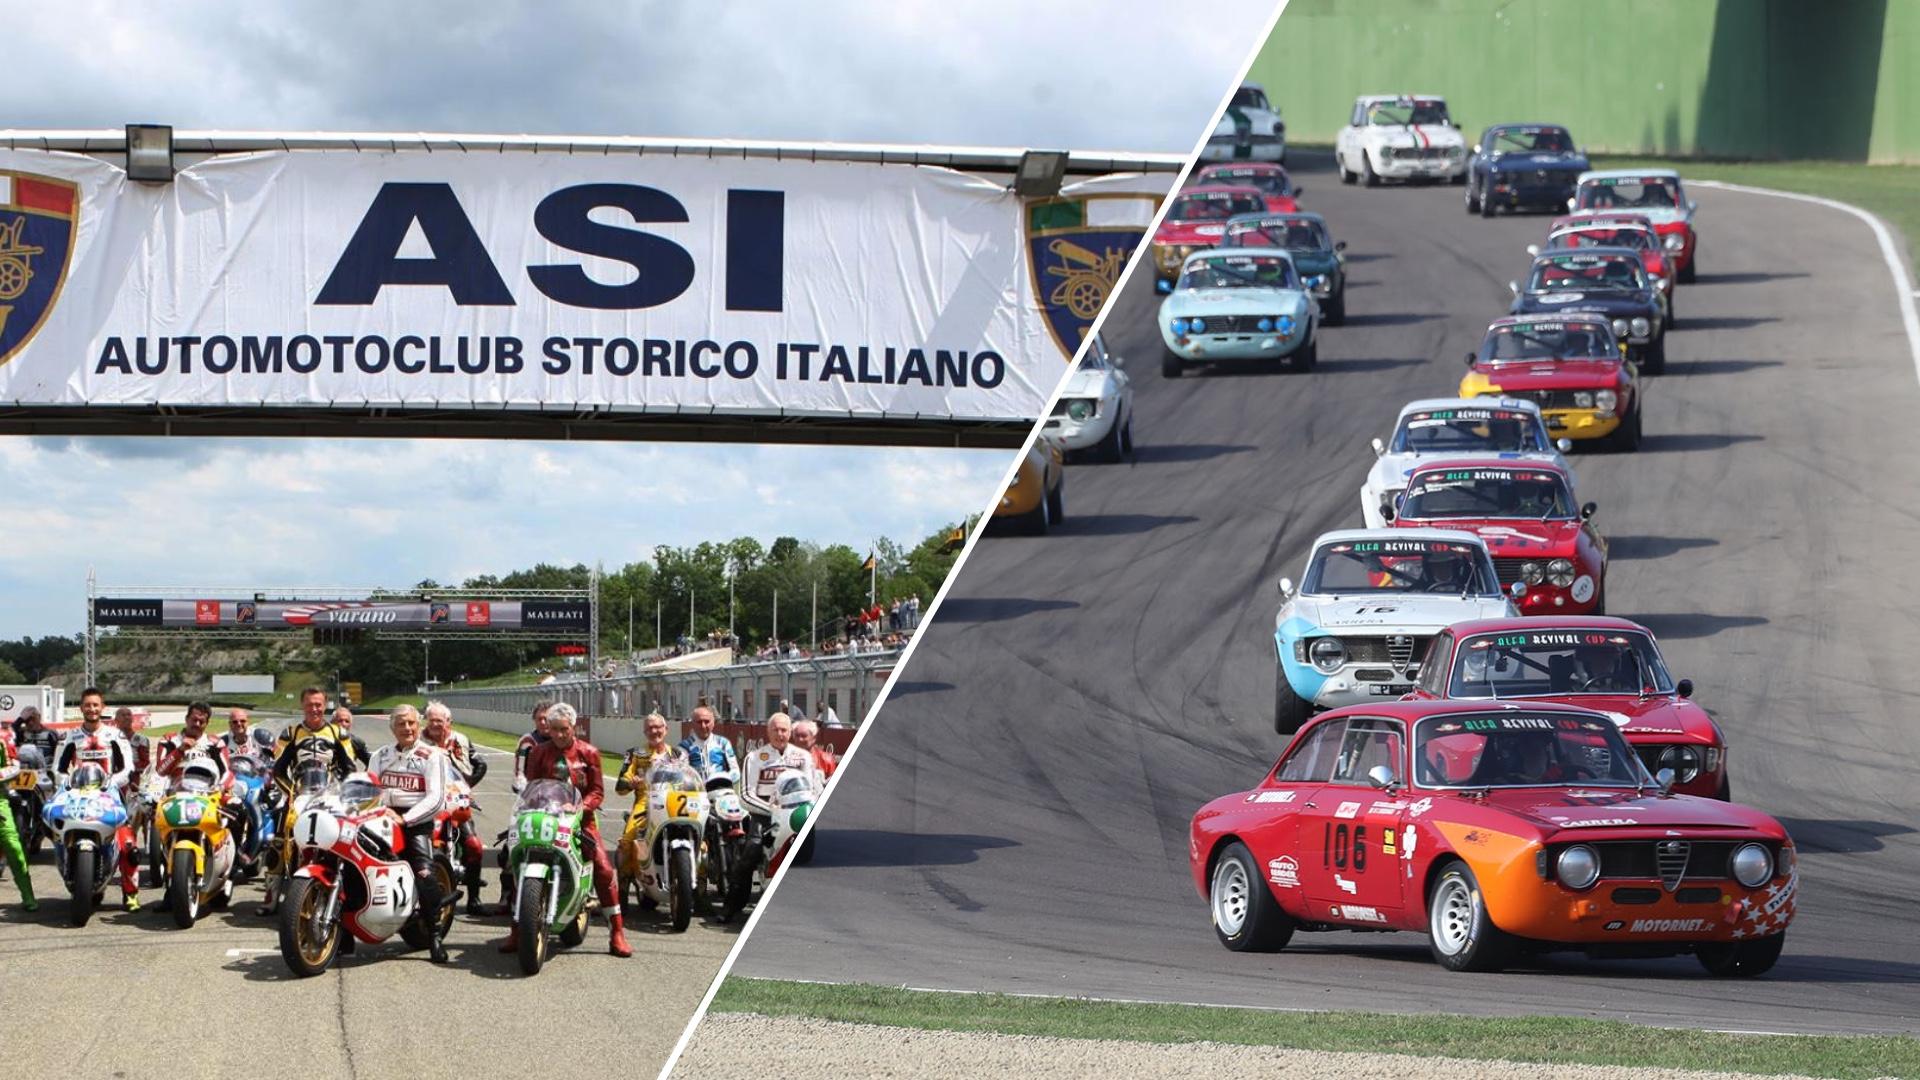 ASI Motoshow e Gruppo Peroni Race. Un weekend all'insegna dell'Heritage.